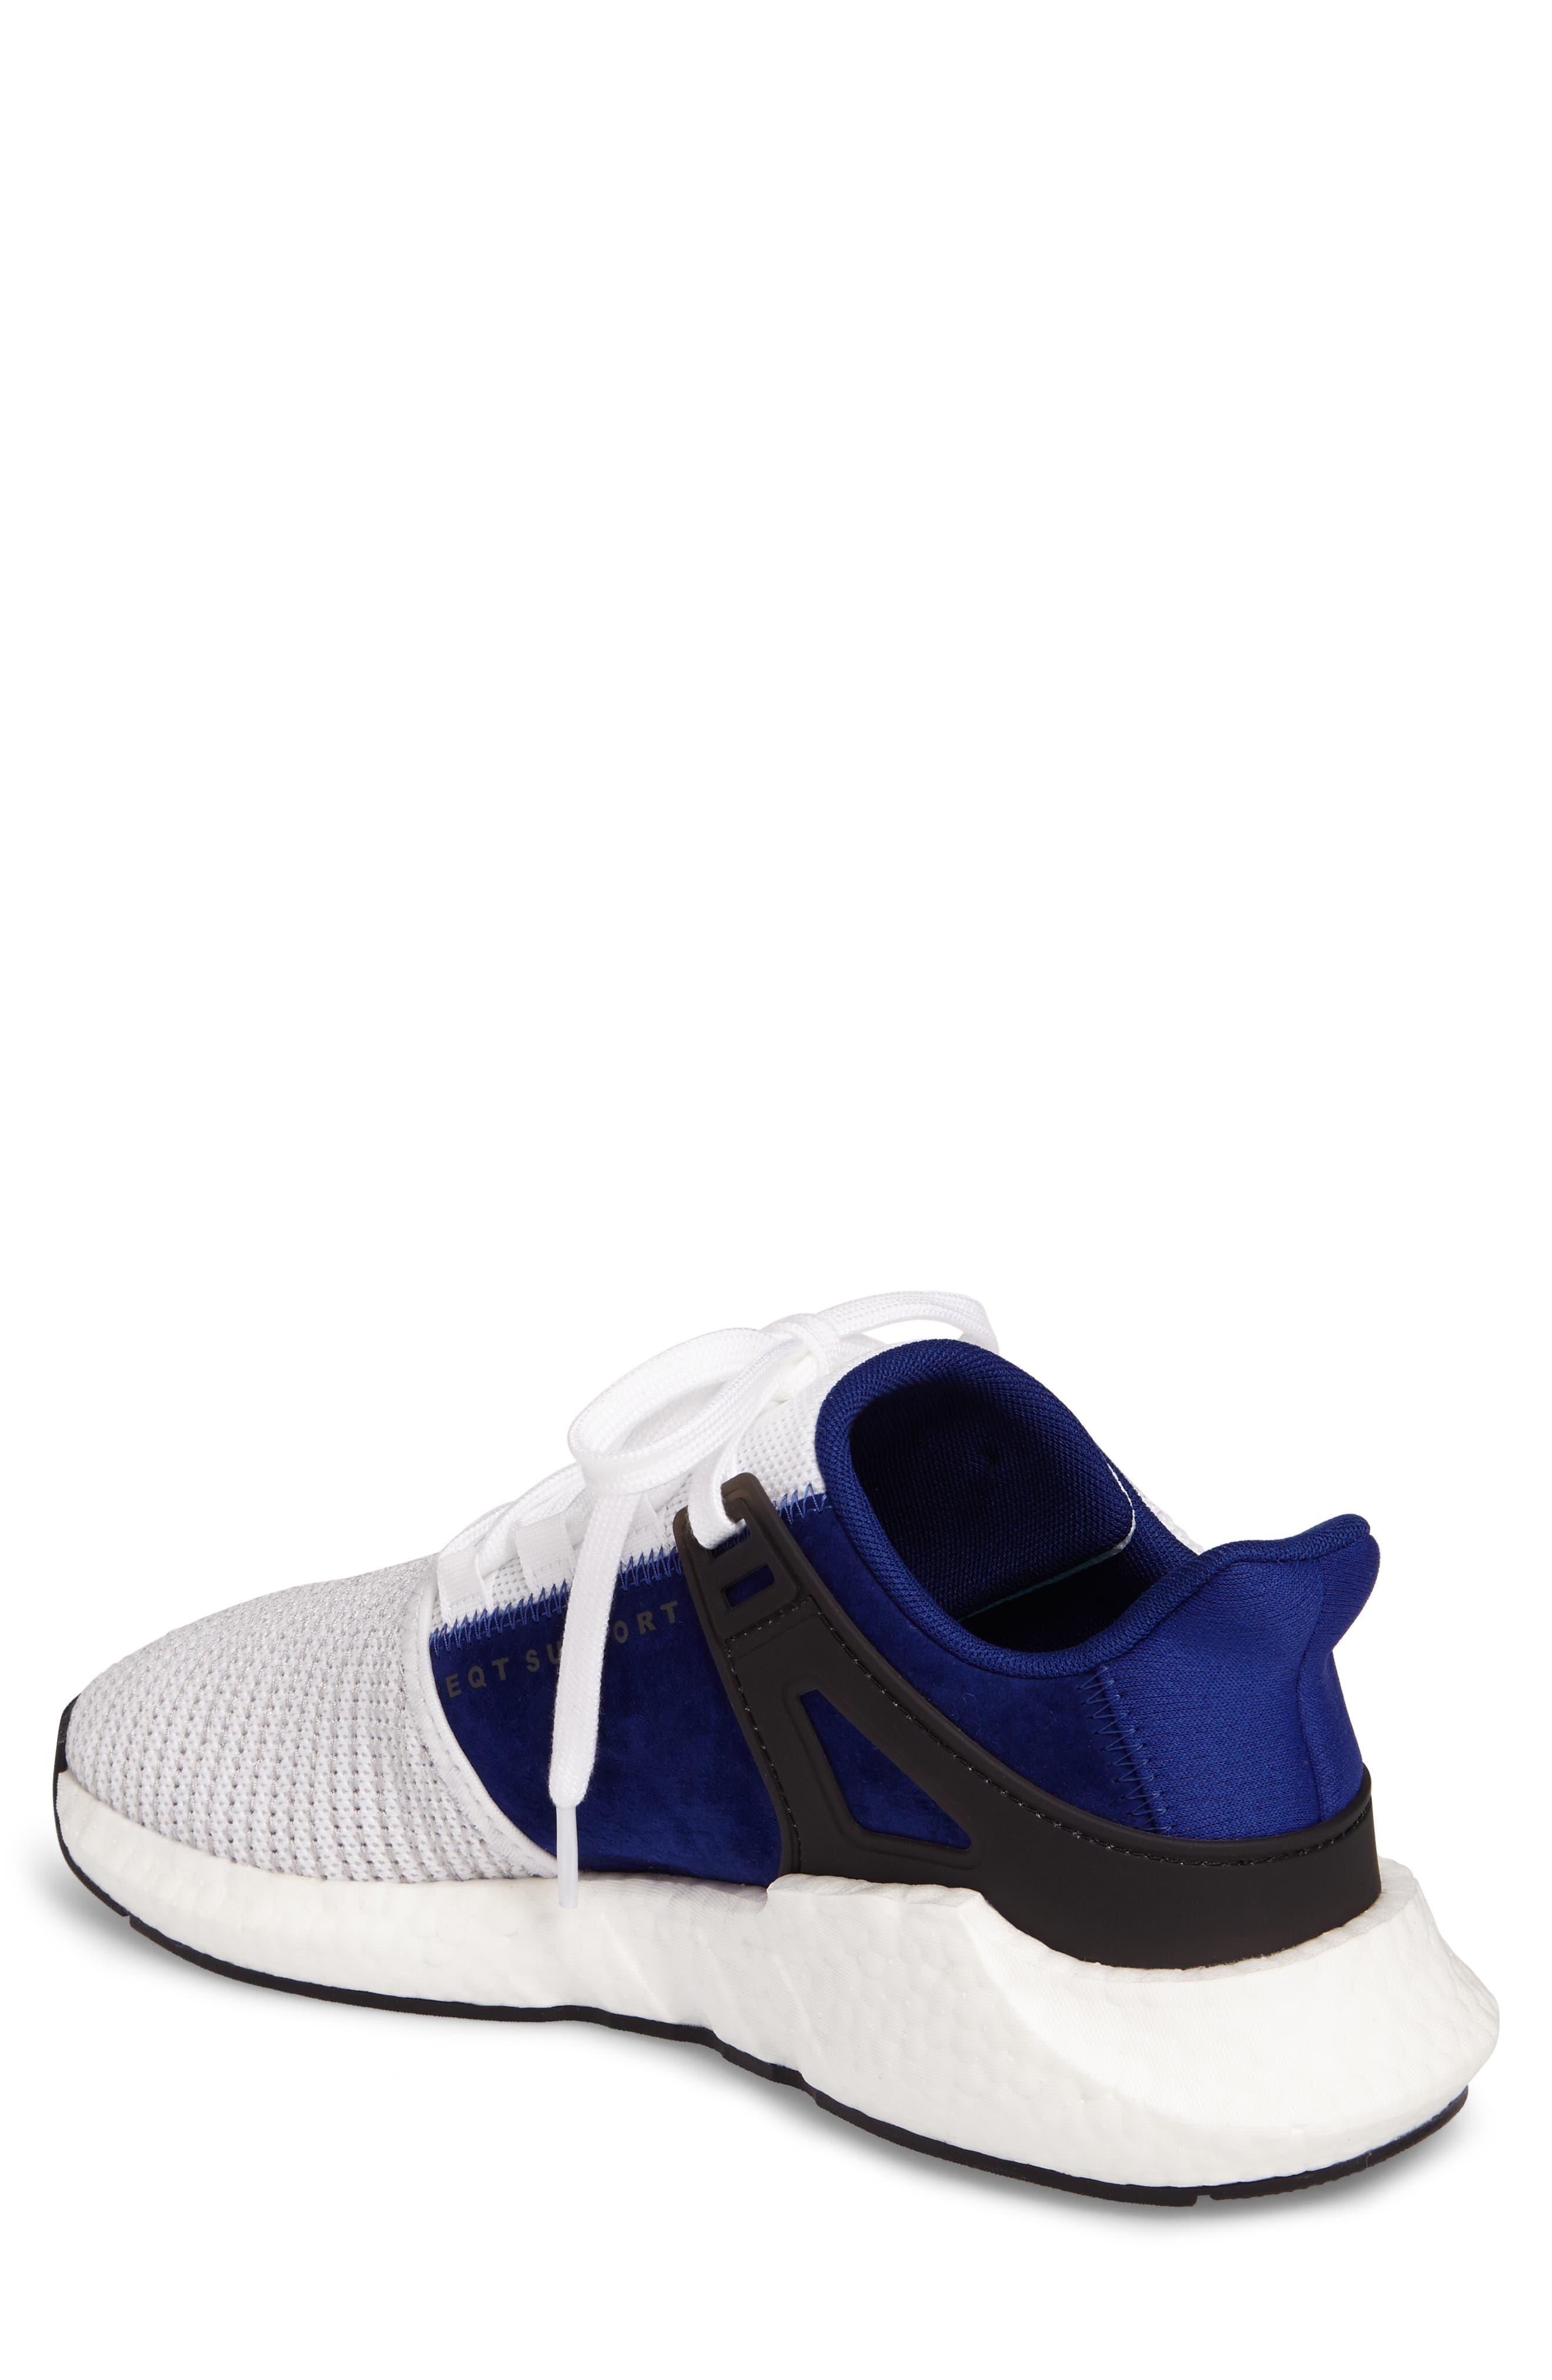 EQT Support 93/17 Sneaker,                             Alternate thumbnail 2, color,                             White/ White/ Core Black